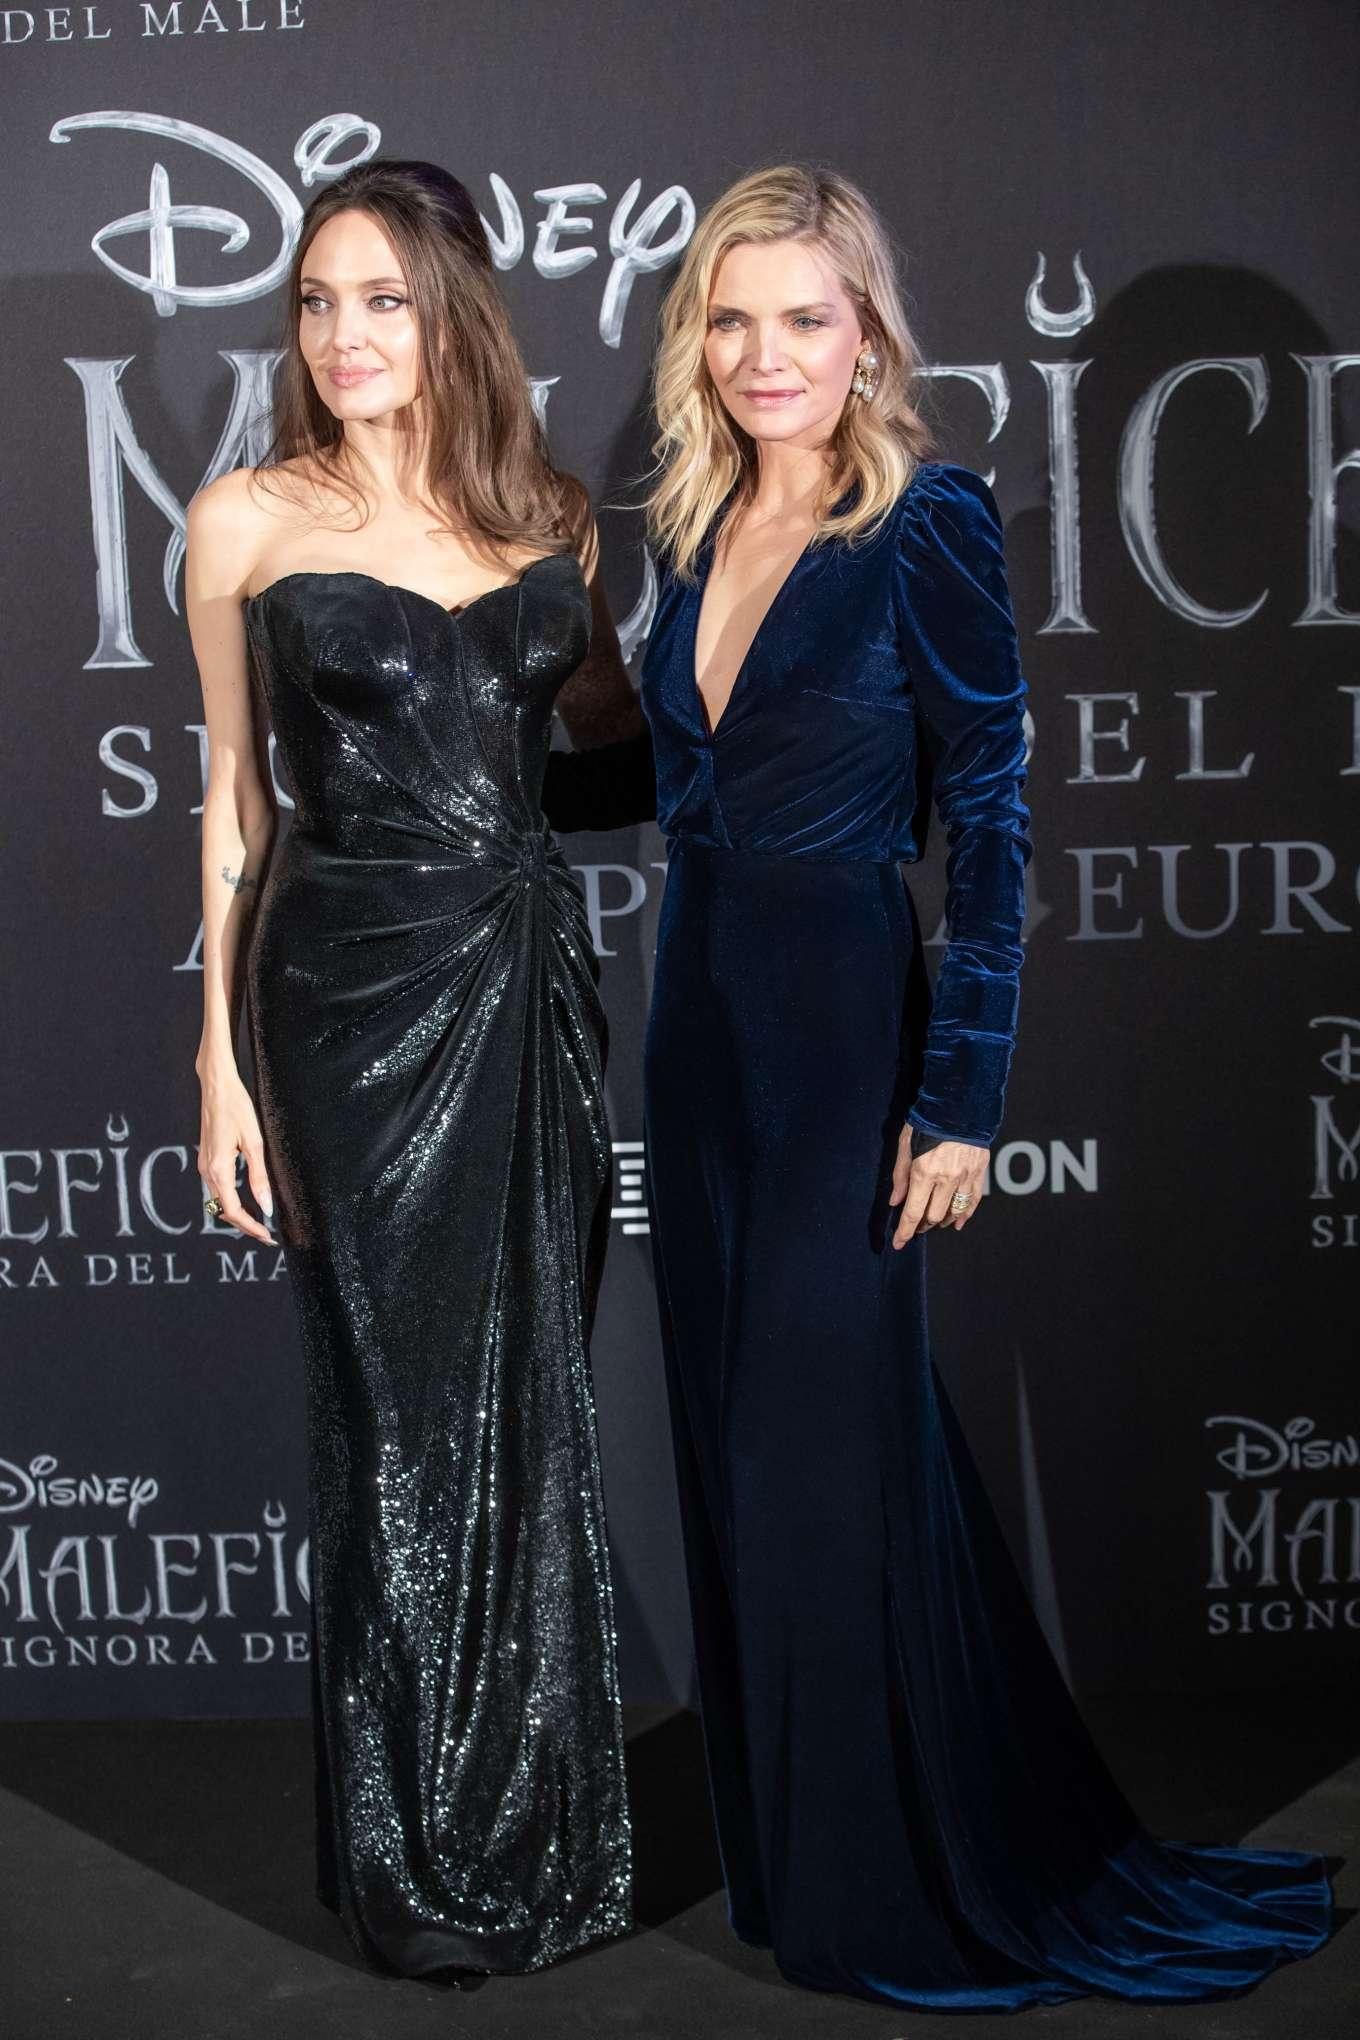 Michelle Pfeiffer 2019 : Michelle Pfeiffer – Maleficent: Mistress Of Evil Premiere in Rome-13